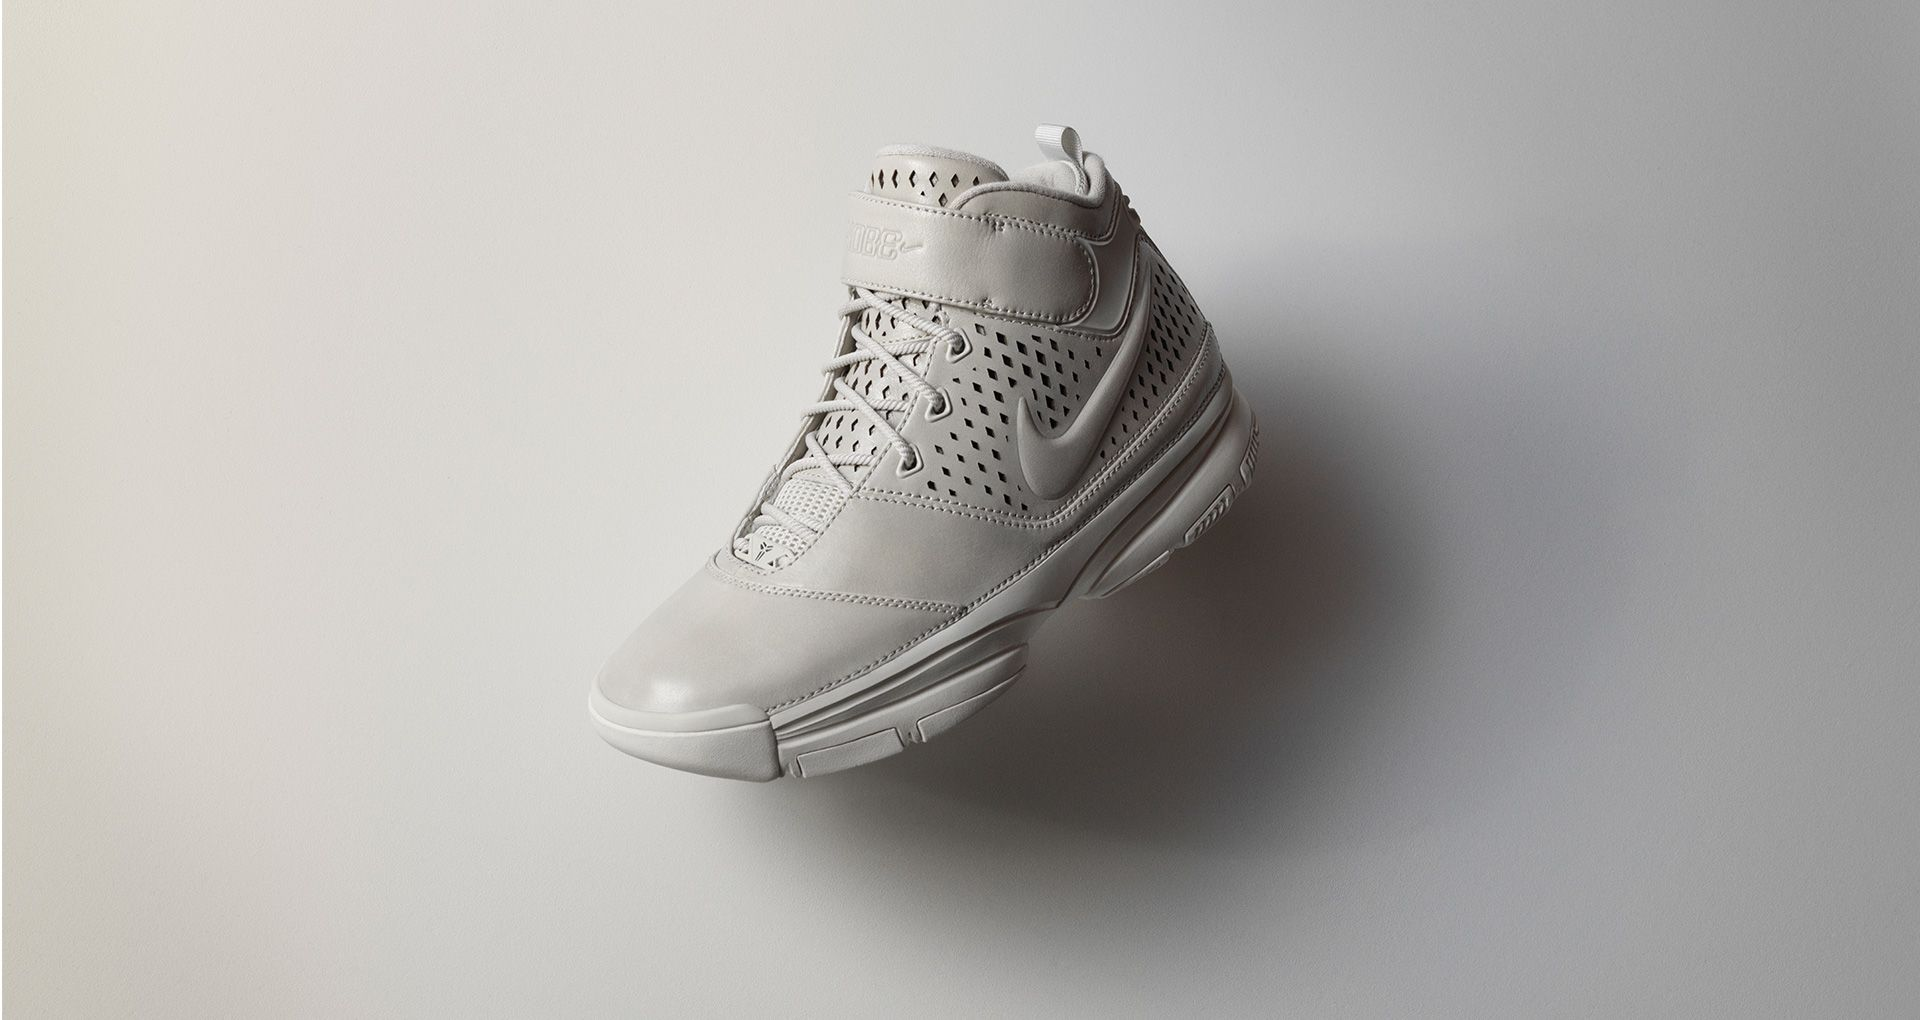 1457e839f31 Nike Zoom Kobe 2  FTB  Release Date. Nike+ Launch FI